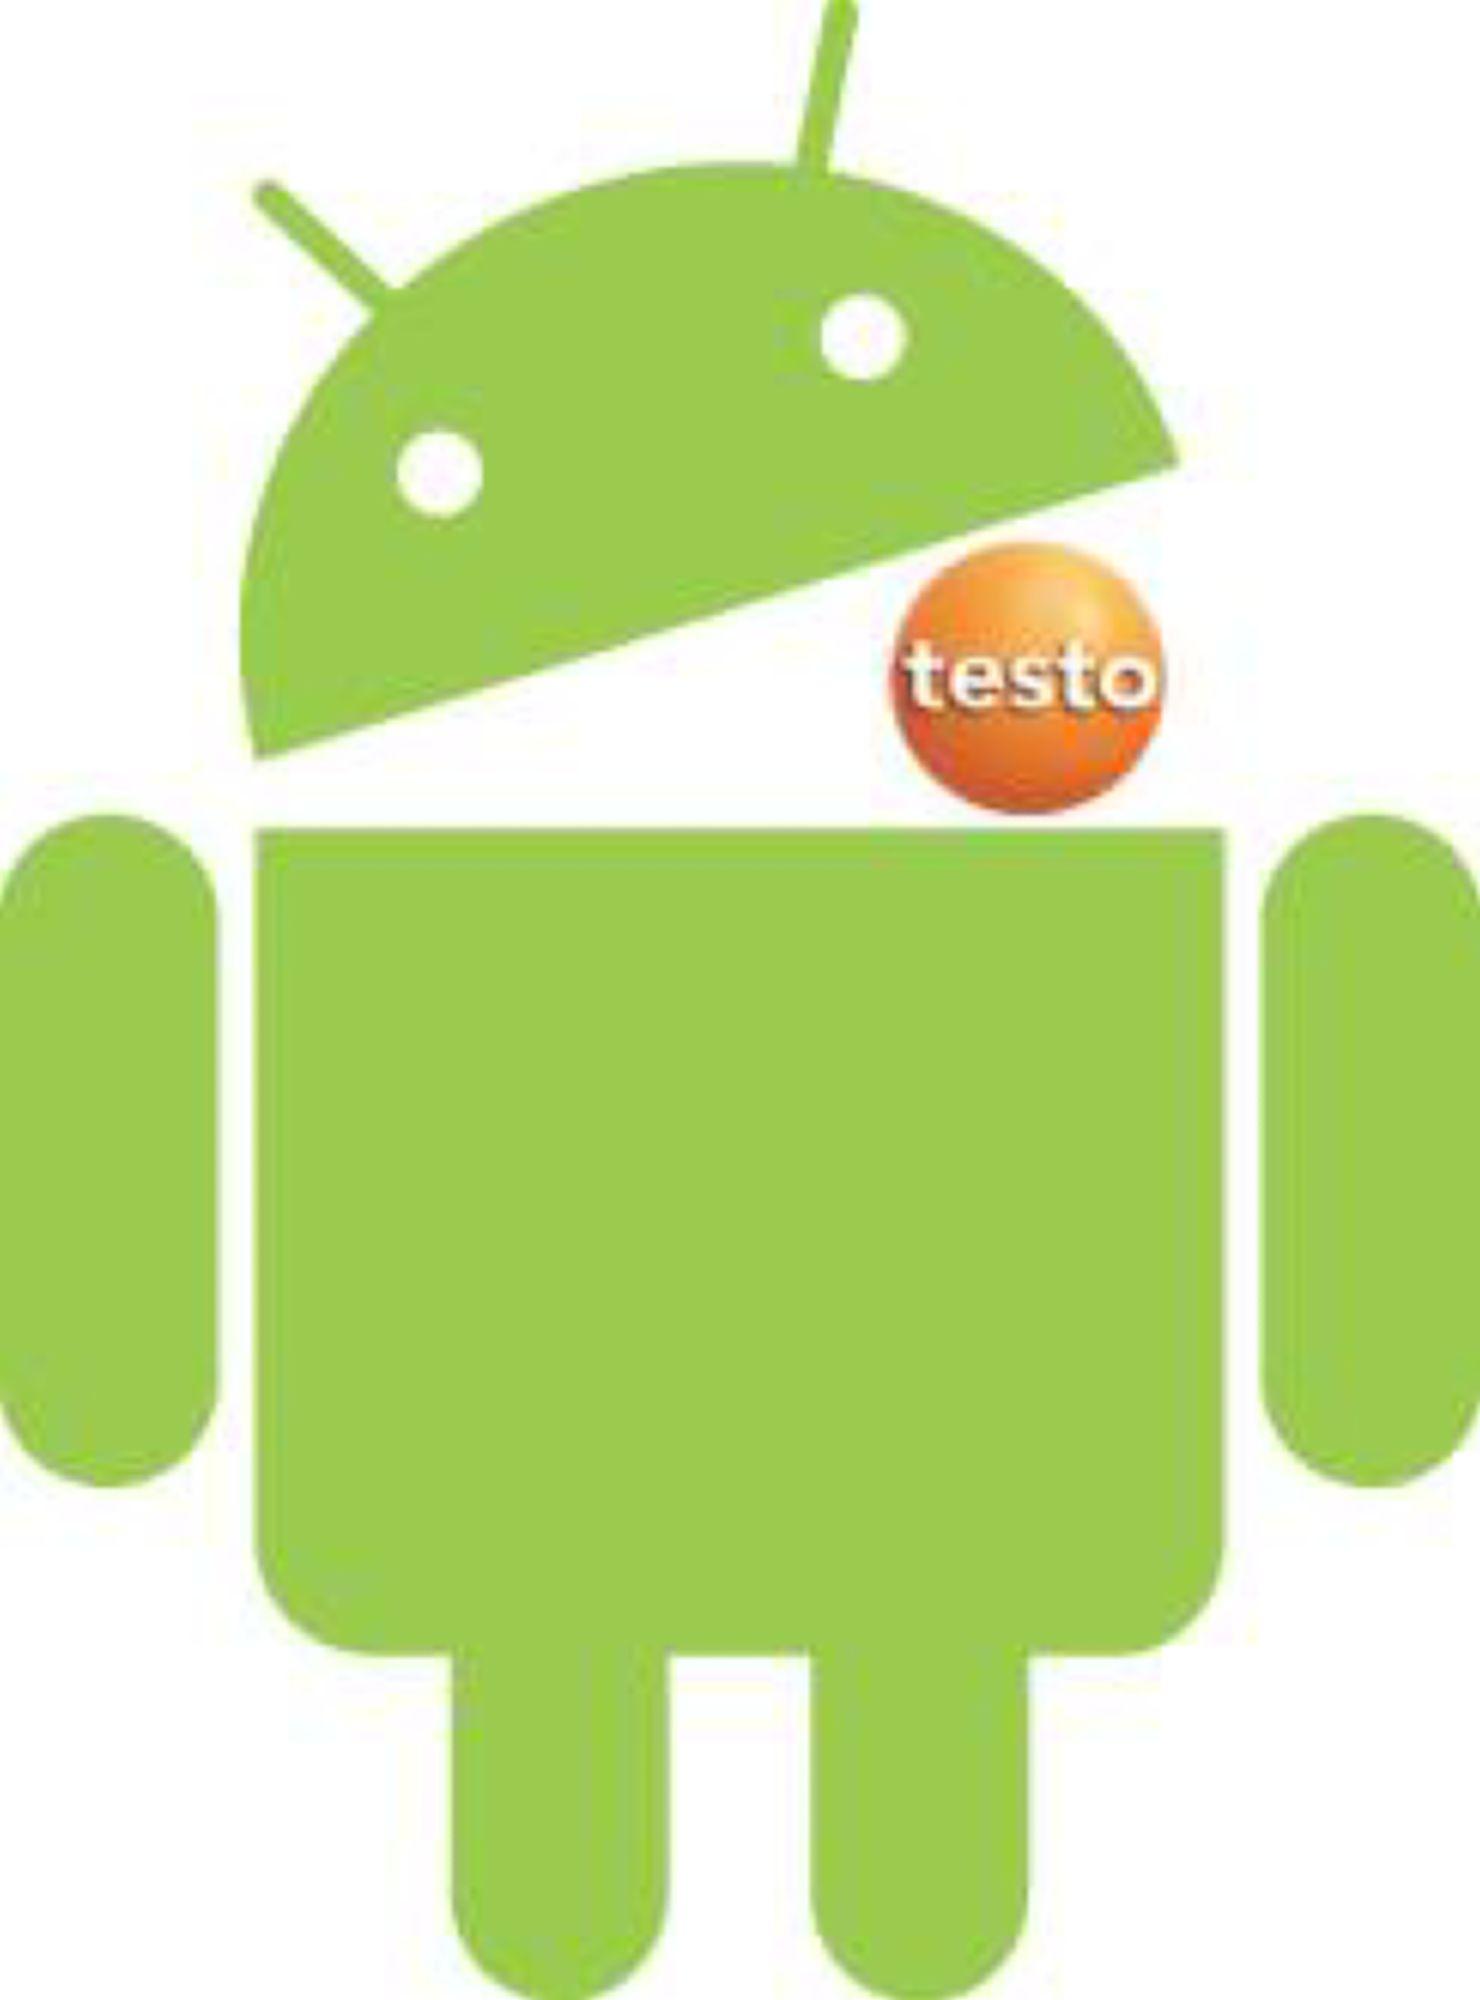 testo_google_android.png